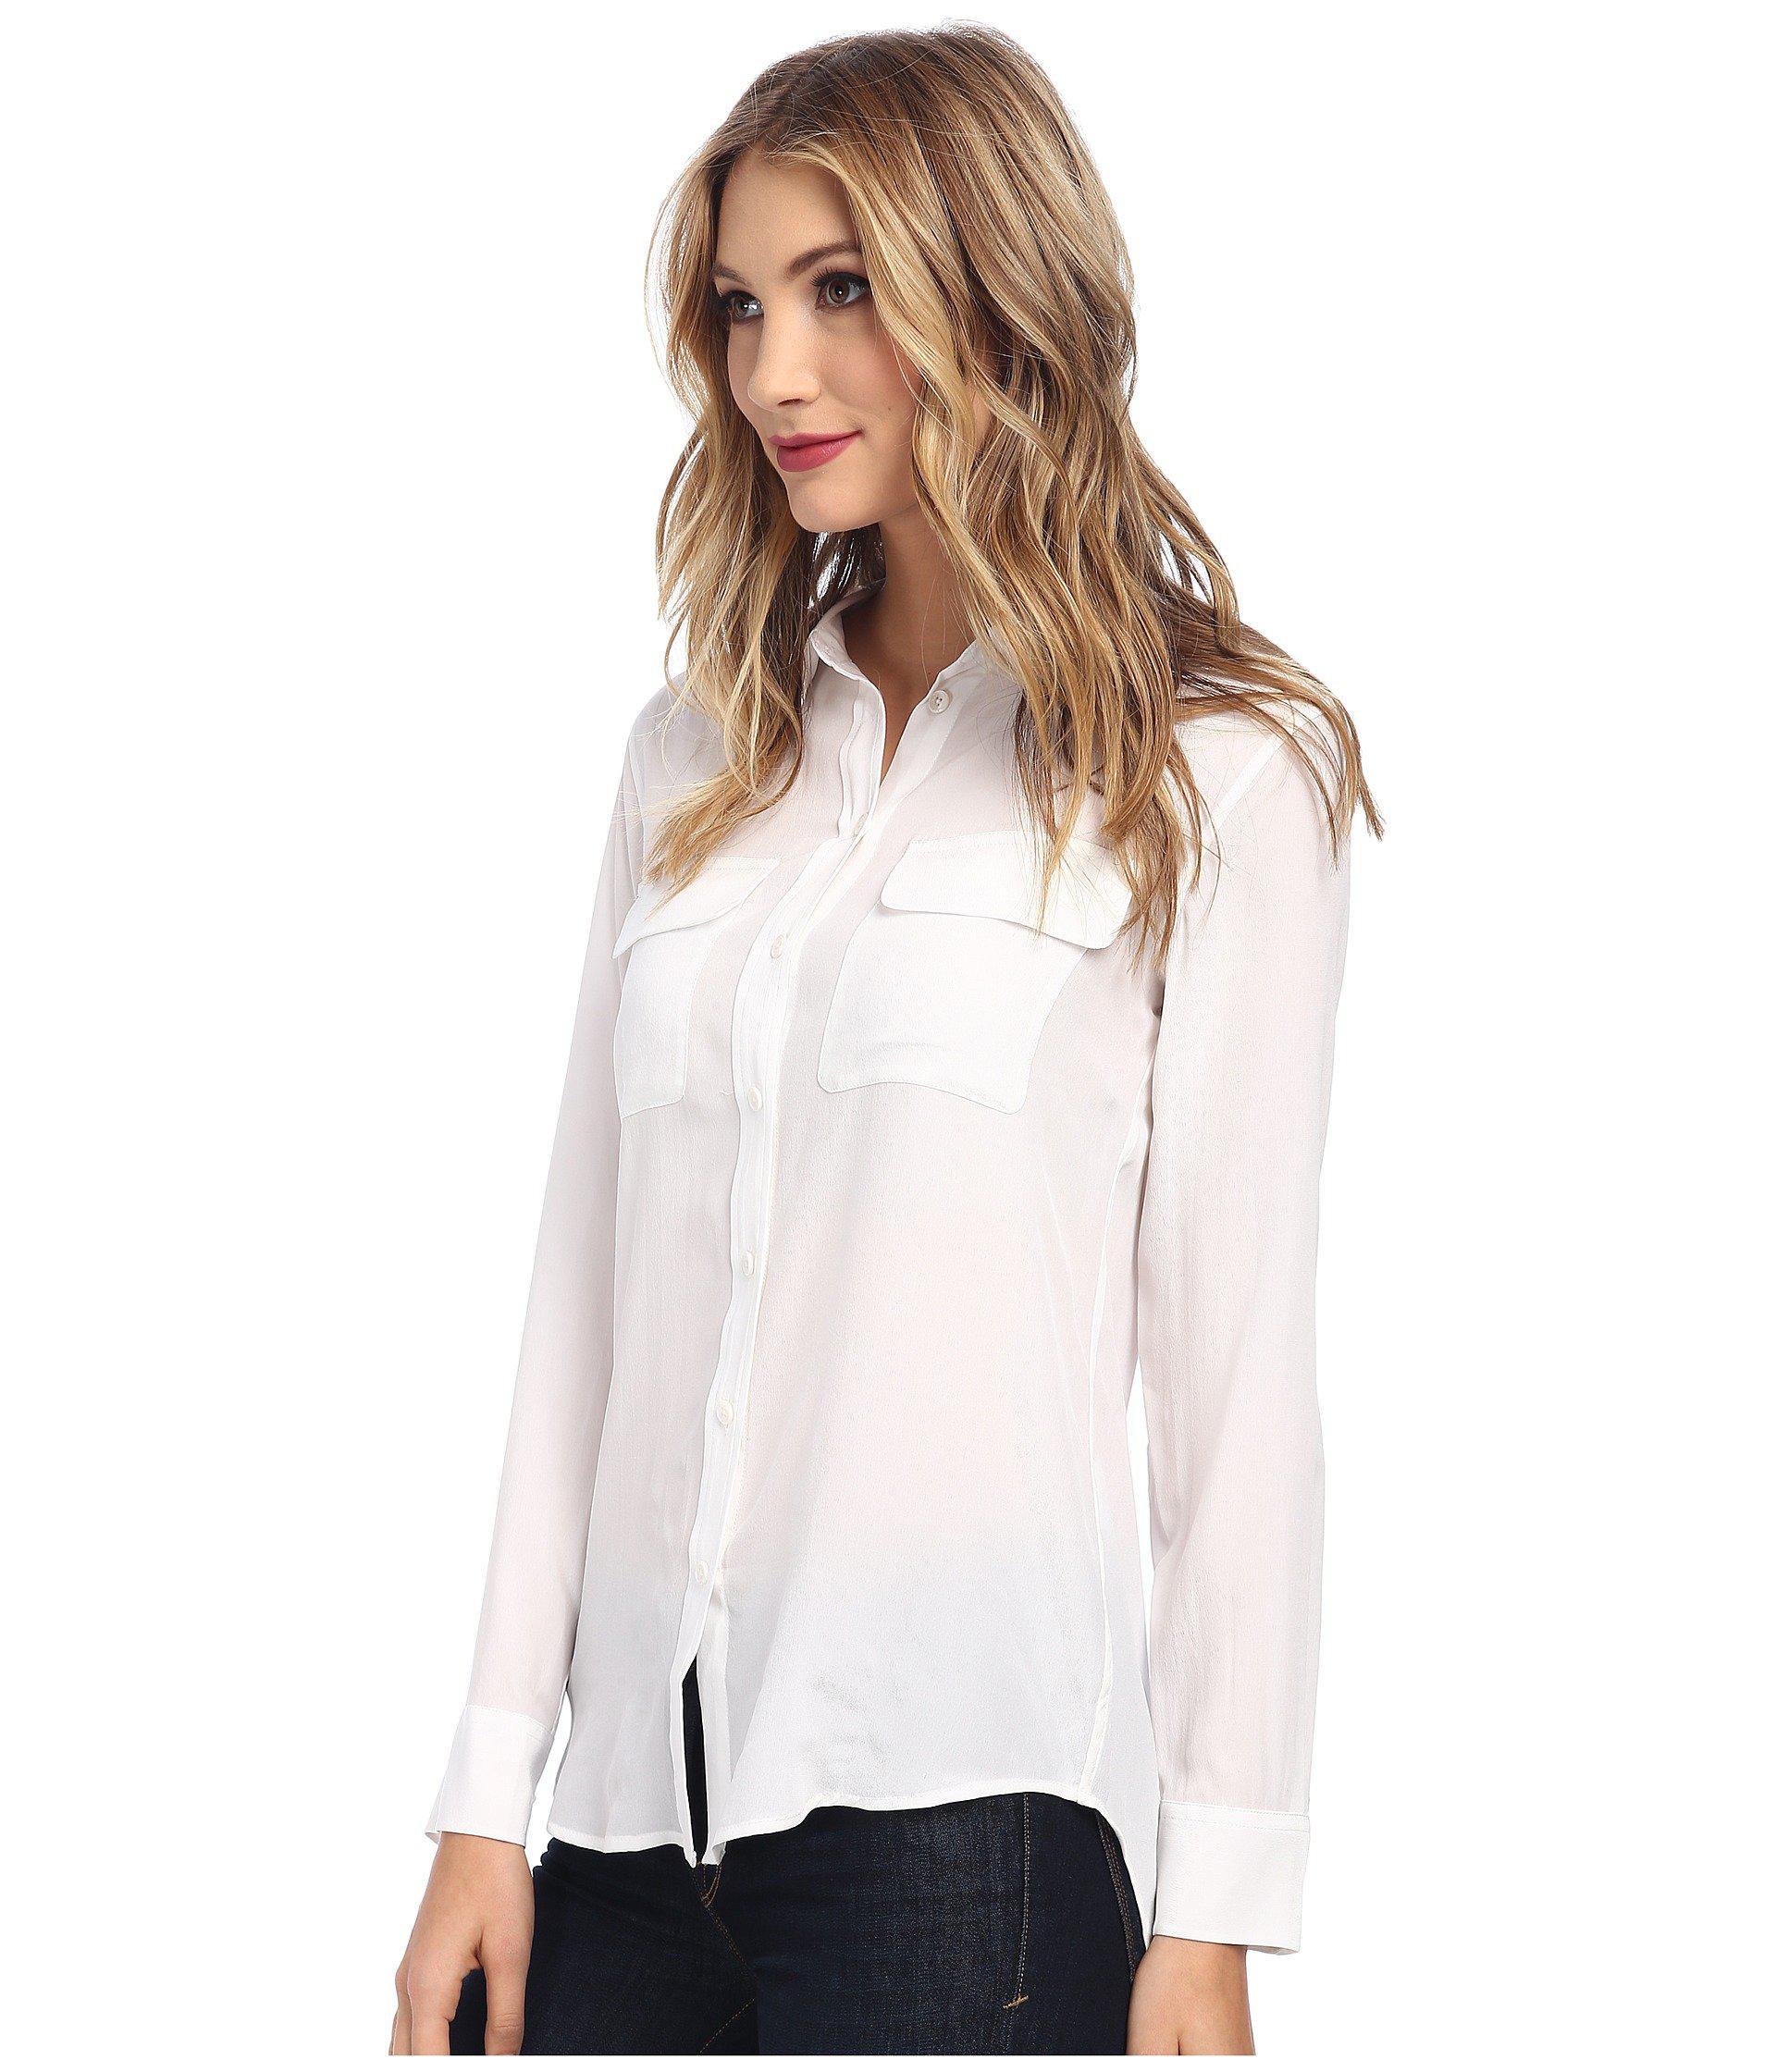 fbcab732443413 Lyst - Equipment Slim Signature Blouse (nature White) Women s Blouse in  White - Save 6.956521739130437%